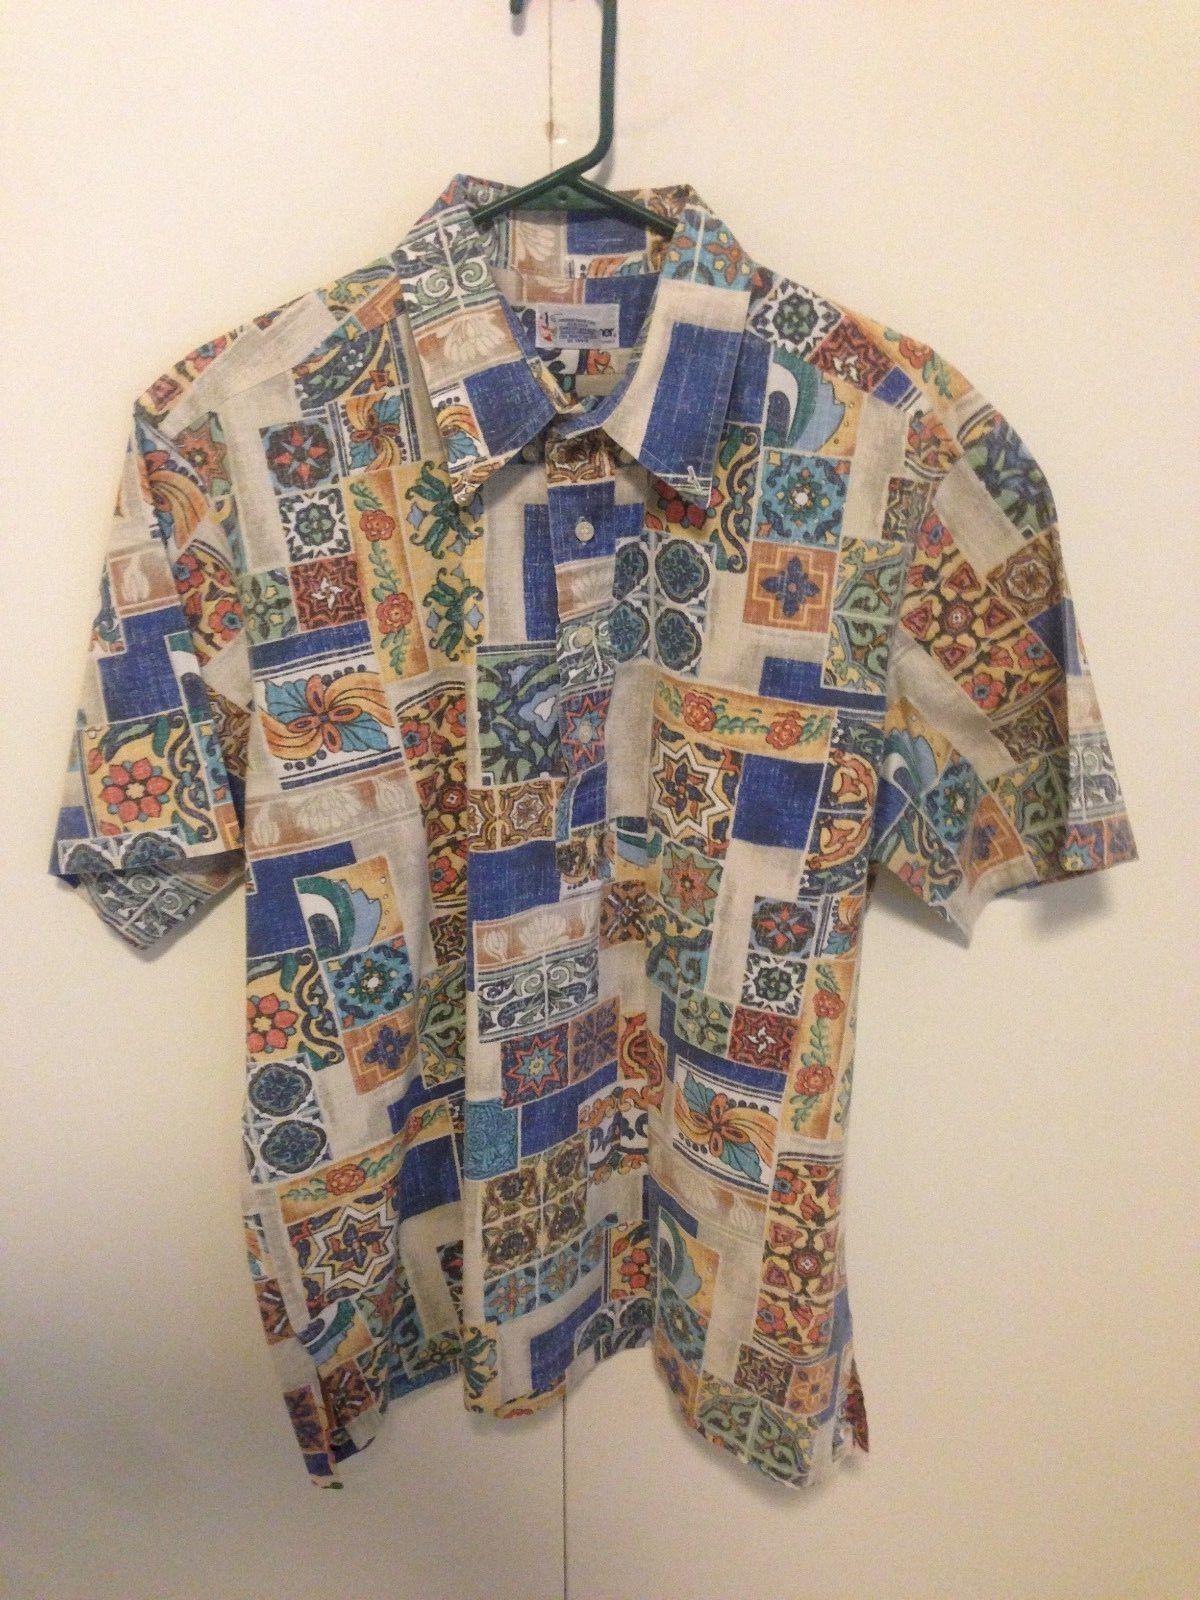 cfdbd6cc4 S l1600. S l1600. Previous. Reyn Spooner Hula Hawaiian Traditionals Mens XL  Shirt tile pattern